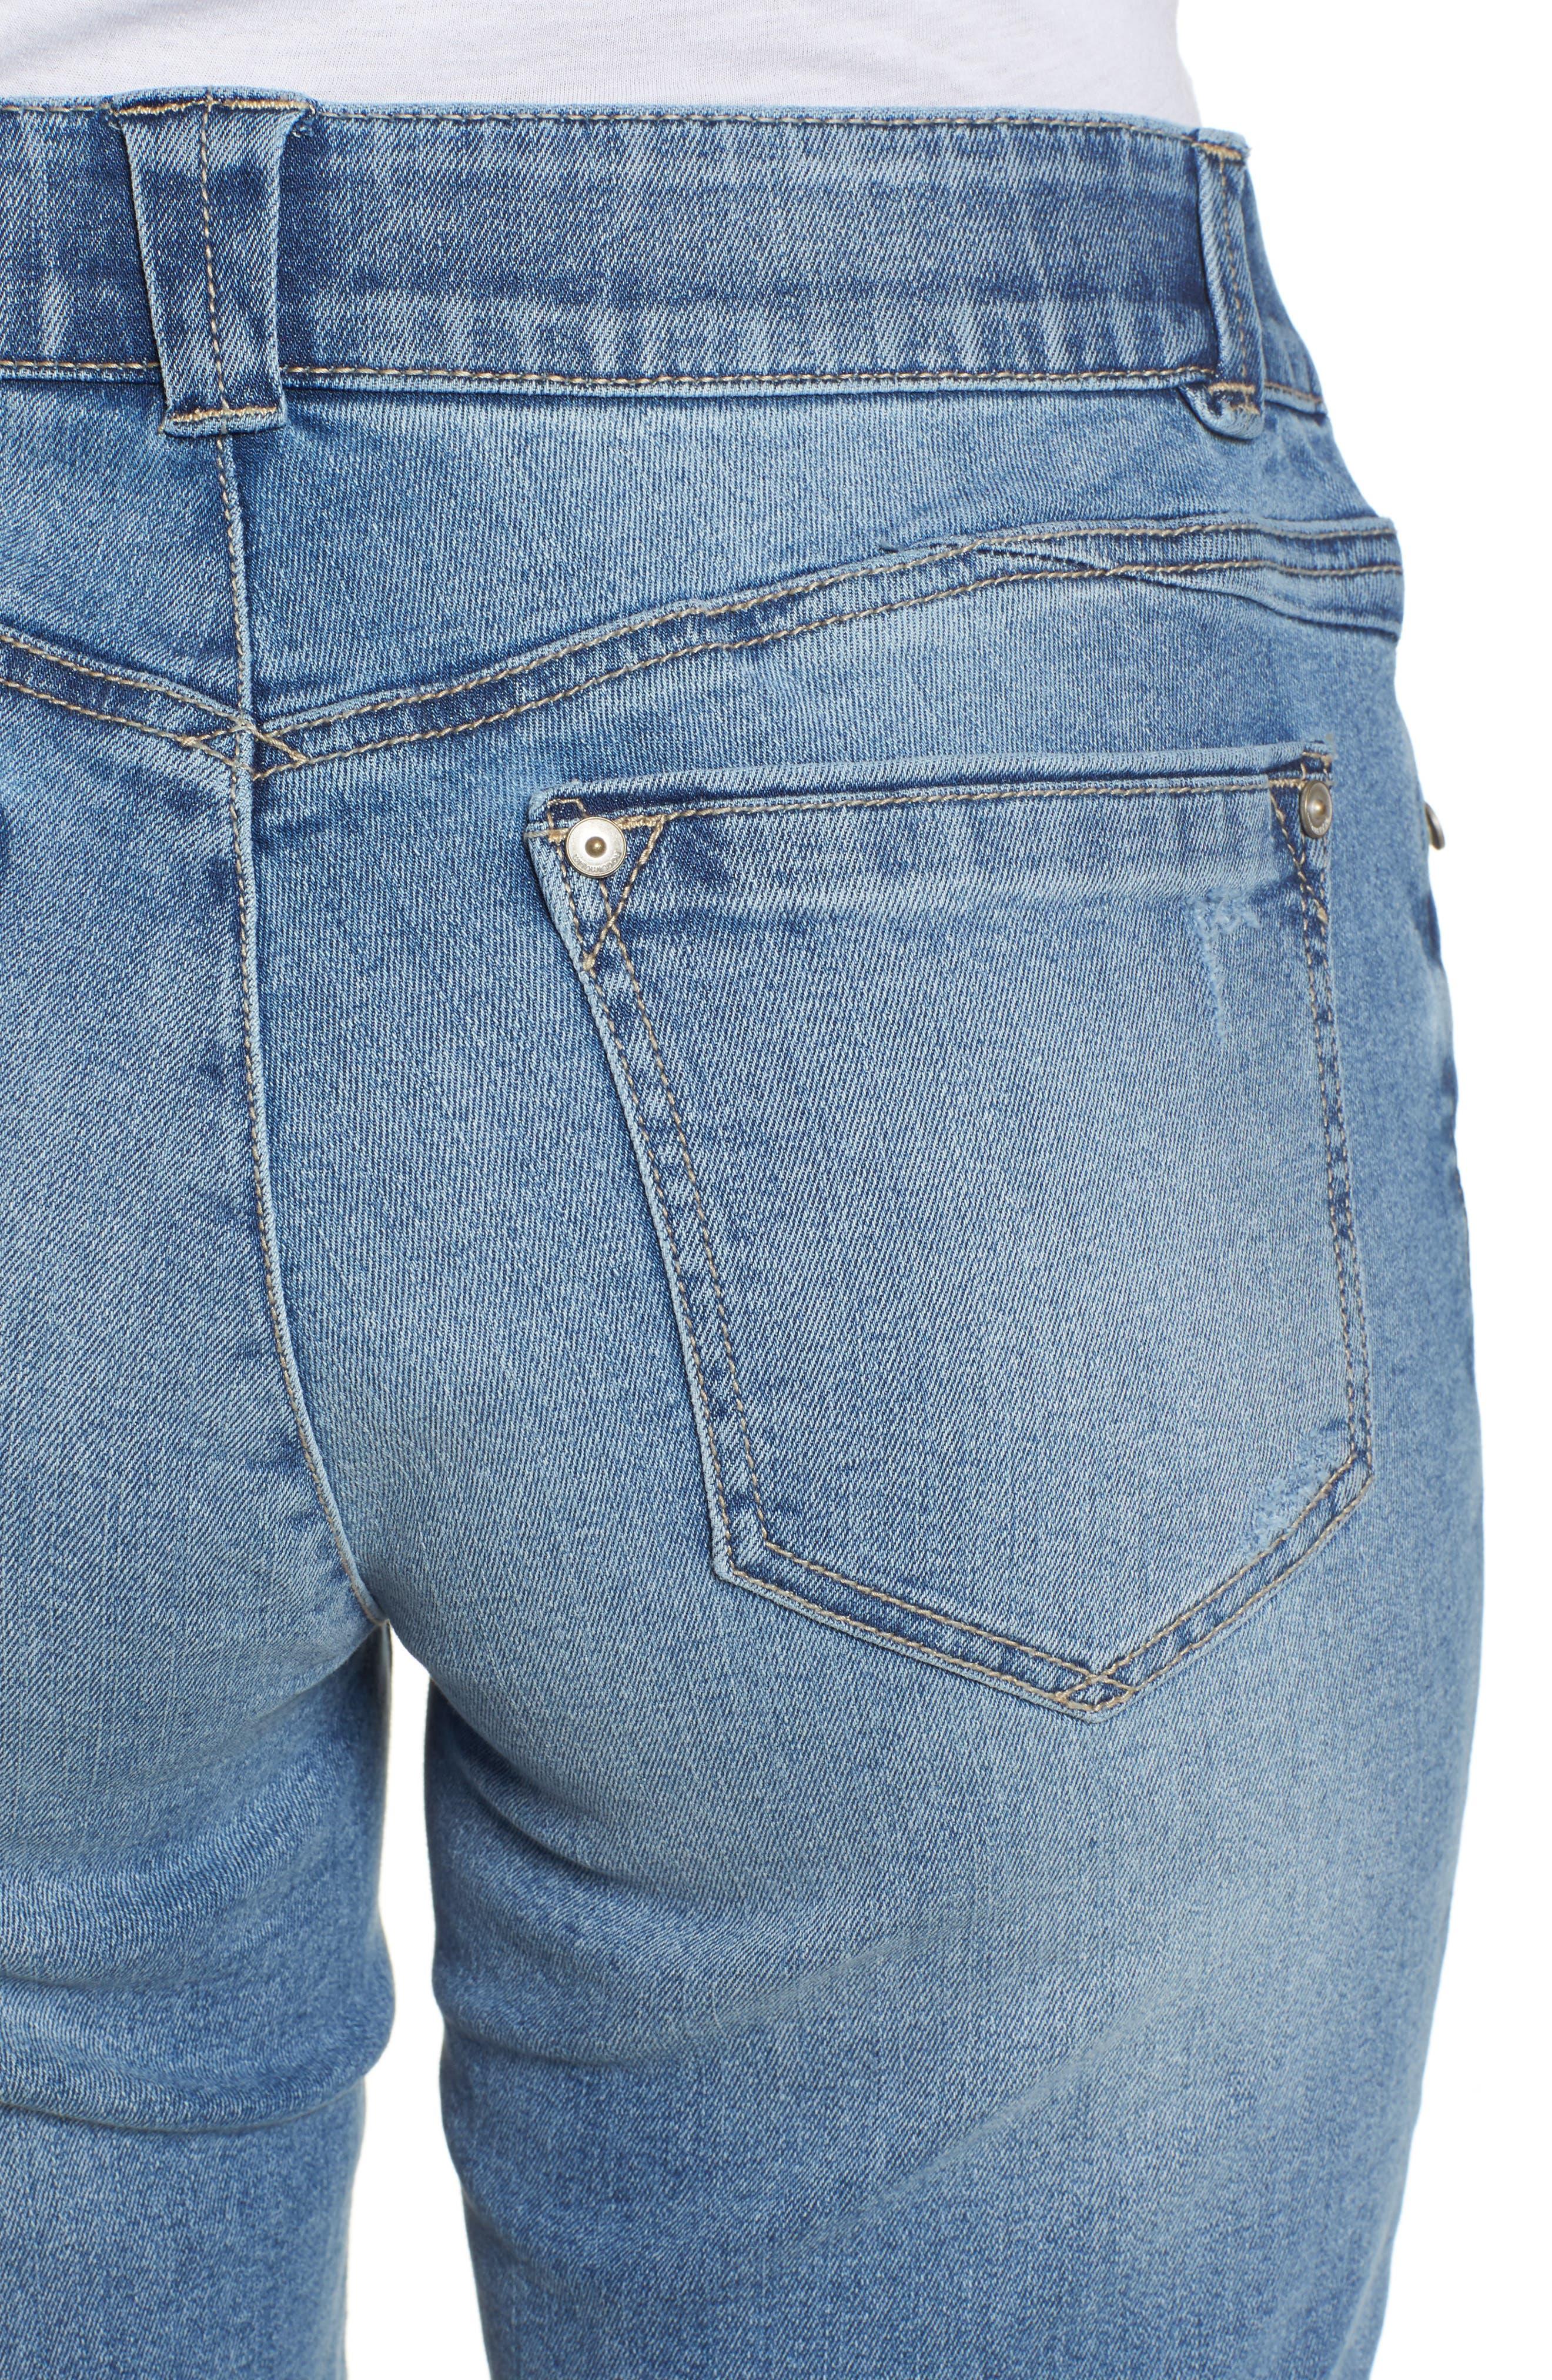 Ab-solution Cuffed Denim Shorts,                             Alternate thumbnail 4, color,                             Light Blue